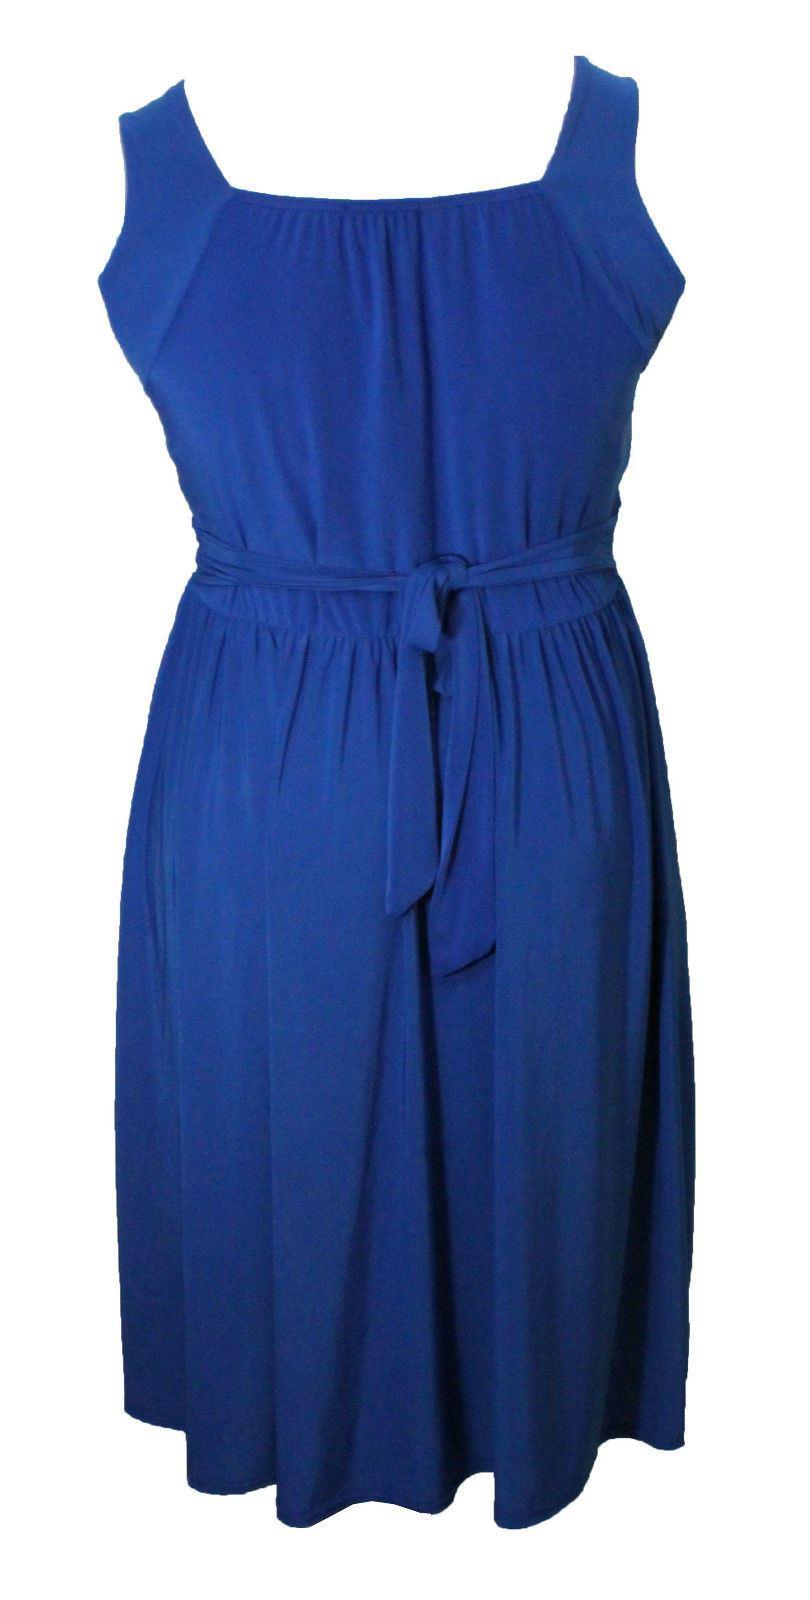 NEW LADIES PLUS SIZE EVENING DRESS BUCKLE WOMENS SHORT ELEGANT COCKTAIL 16-26